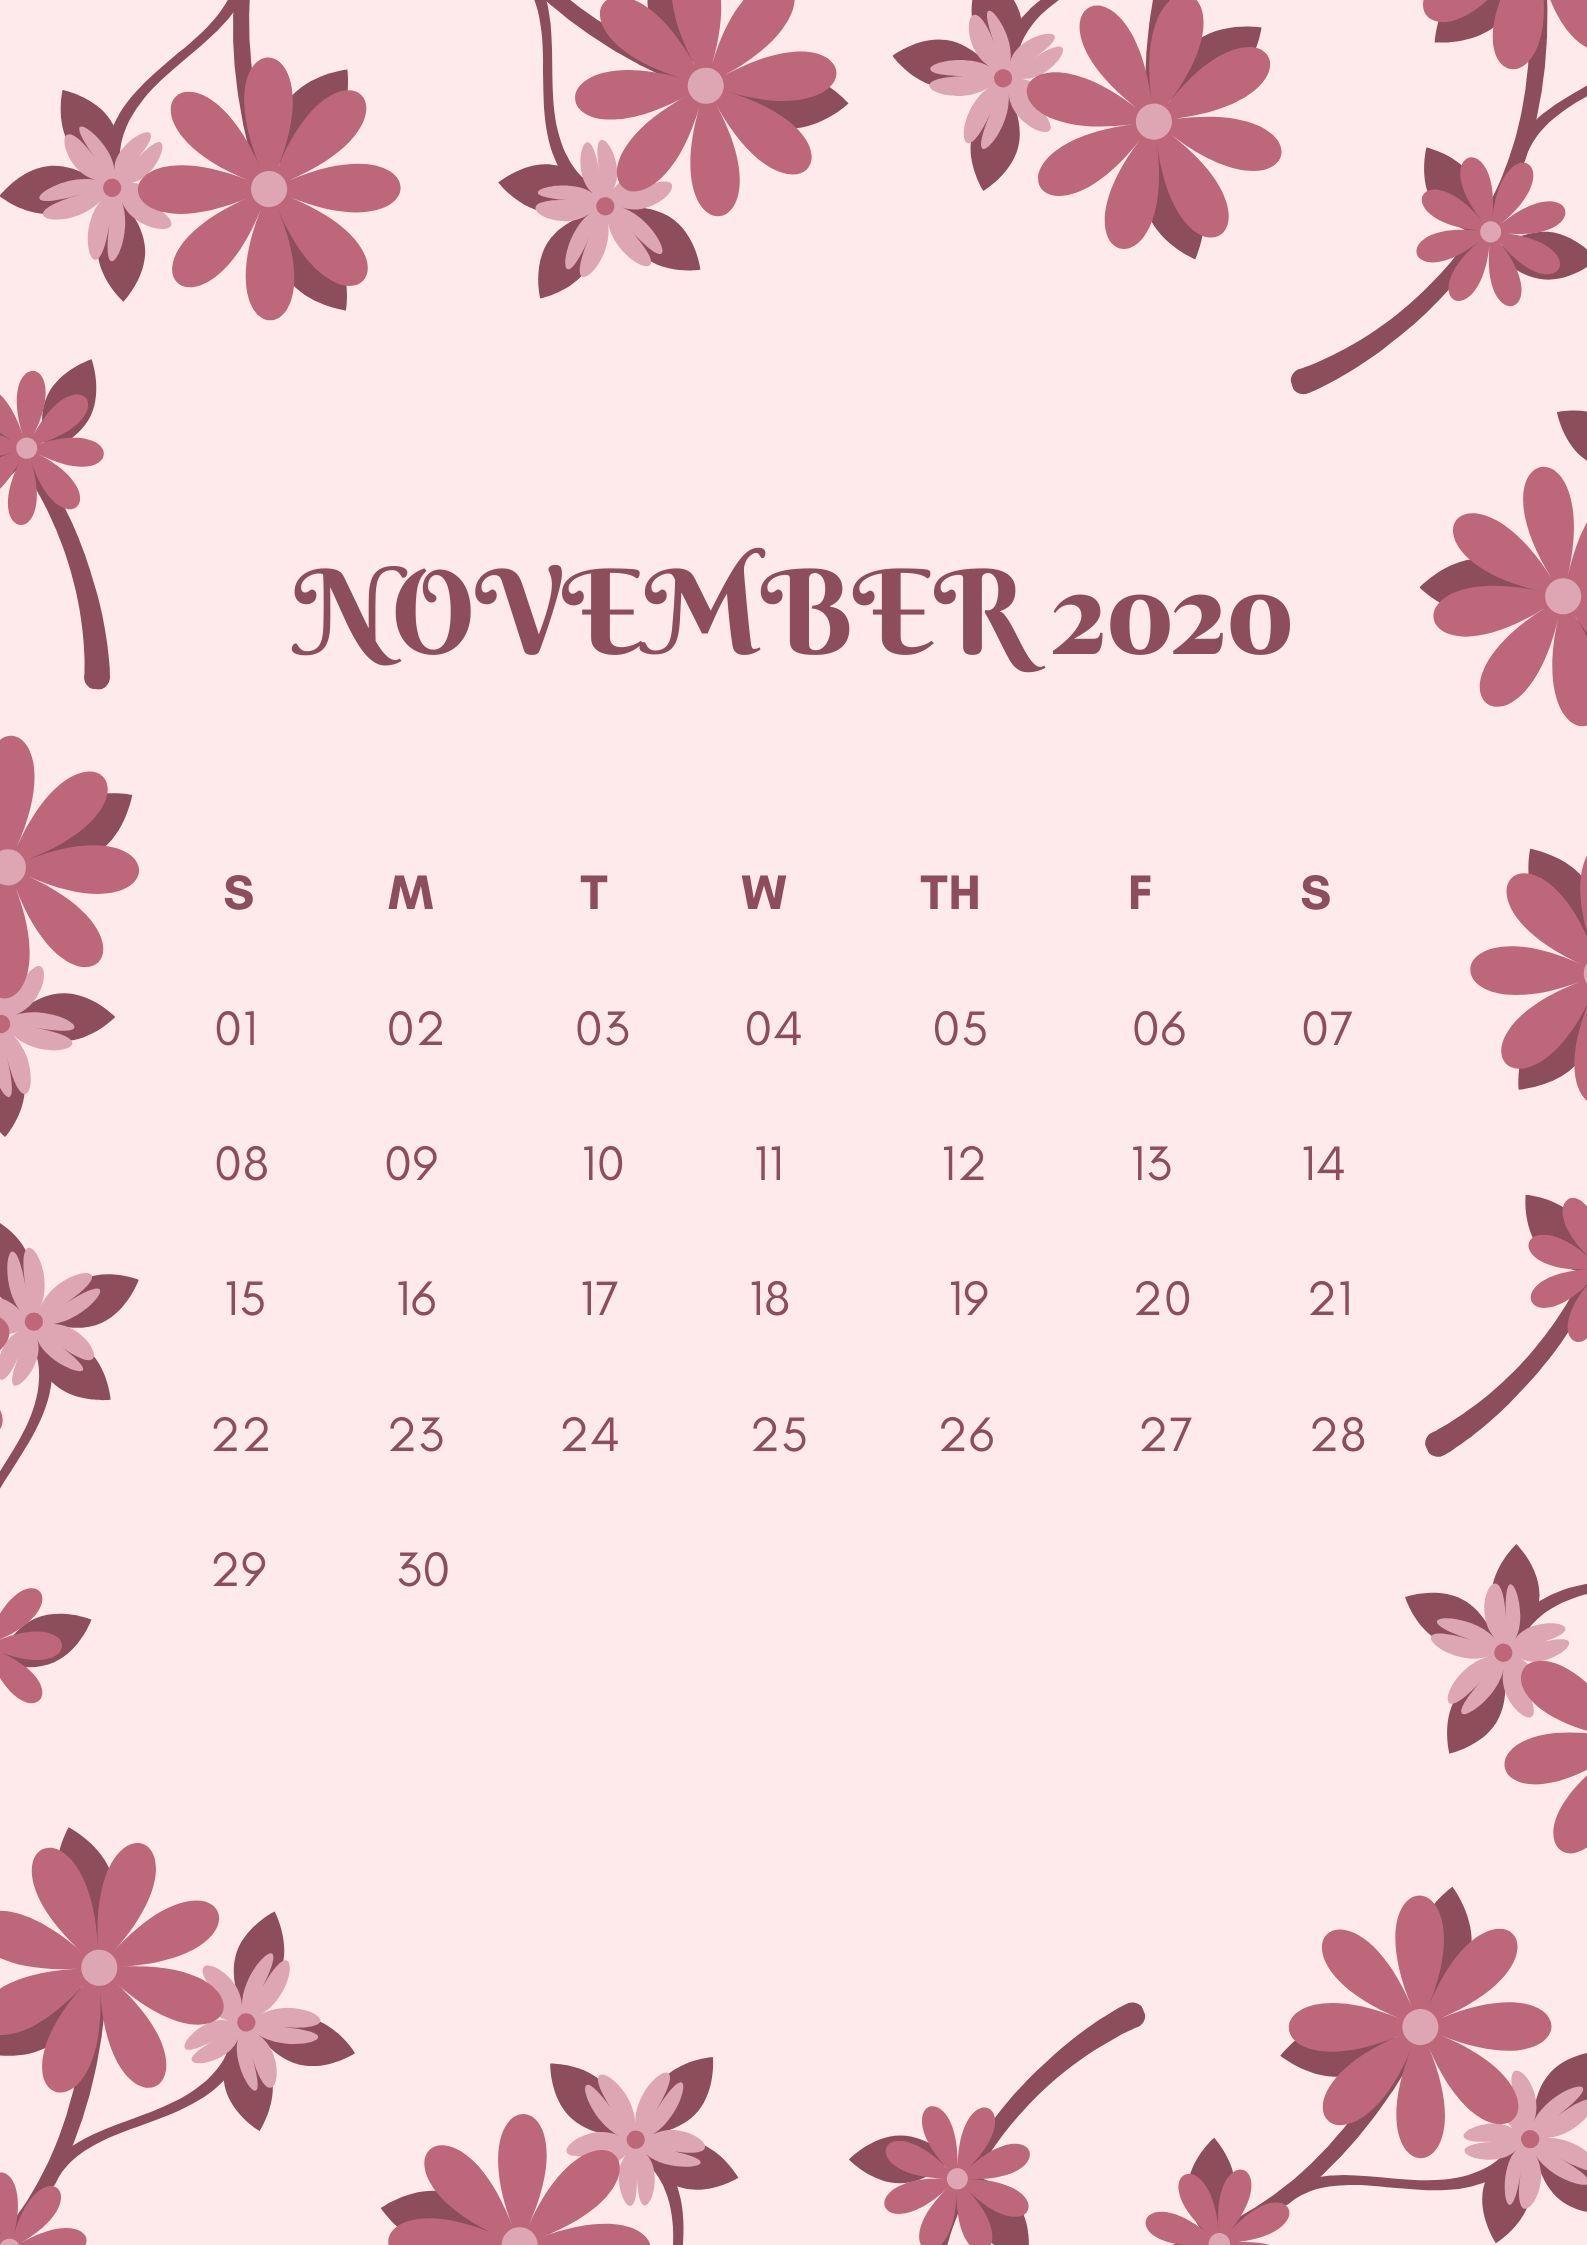 2020 Floral Printable Monthly Calendar Download Calendar